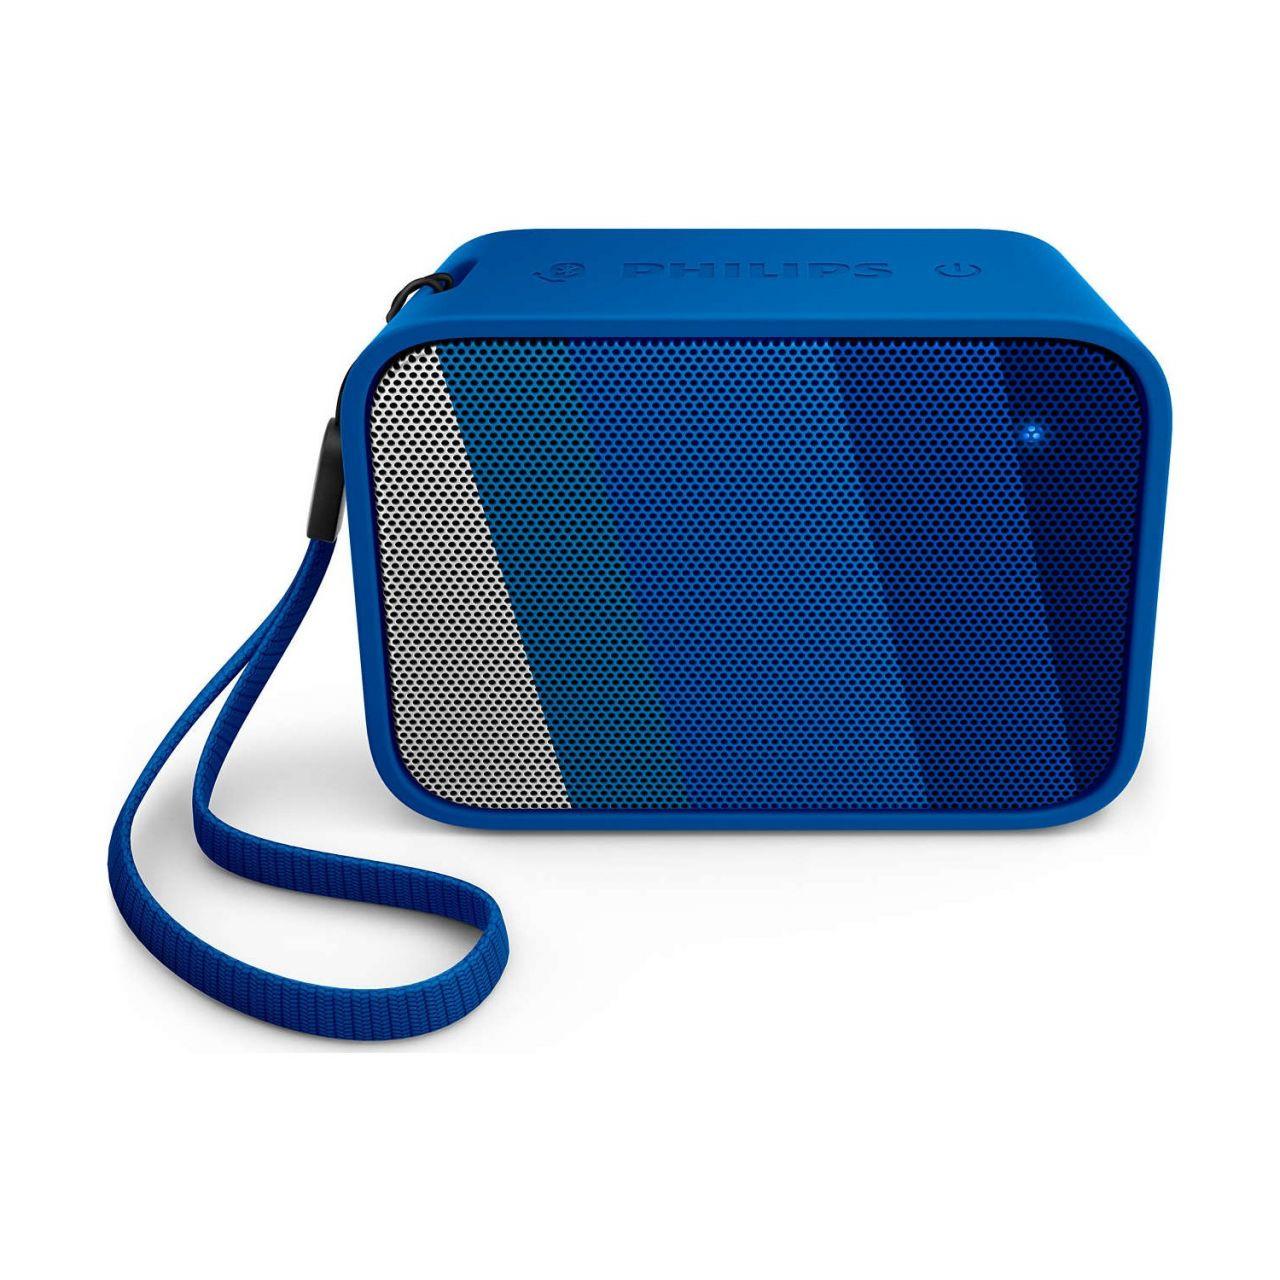 250 TL altı en iyi 10 Bluetooth hoparlör - Ocak 2020 - Page 2